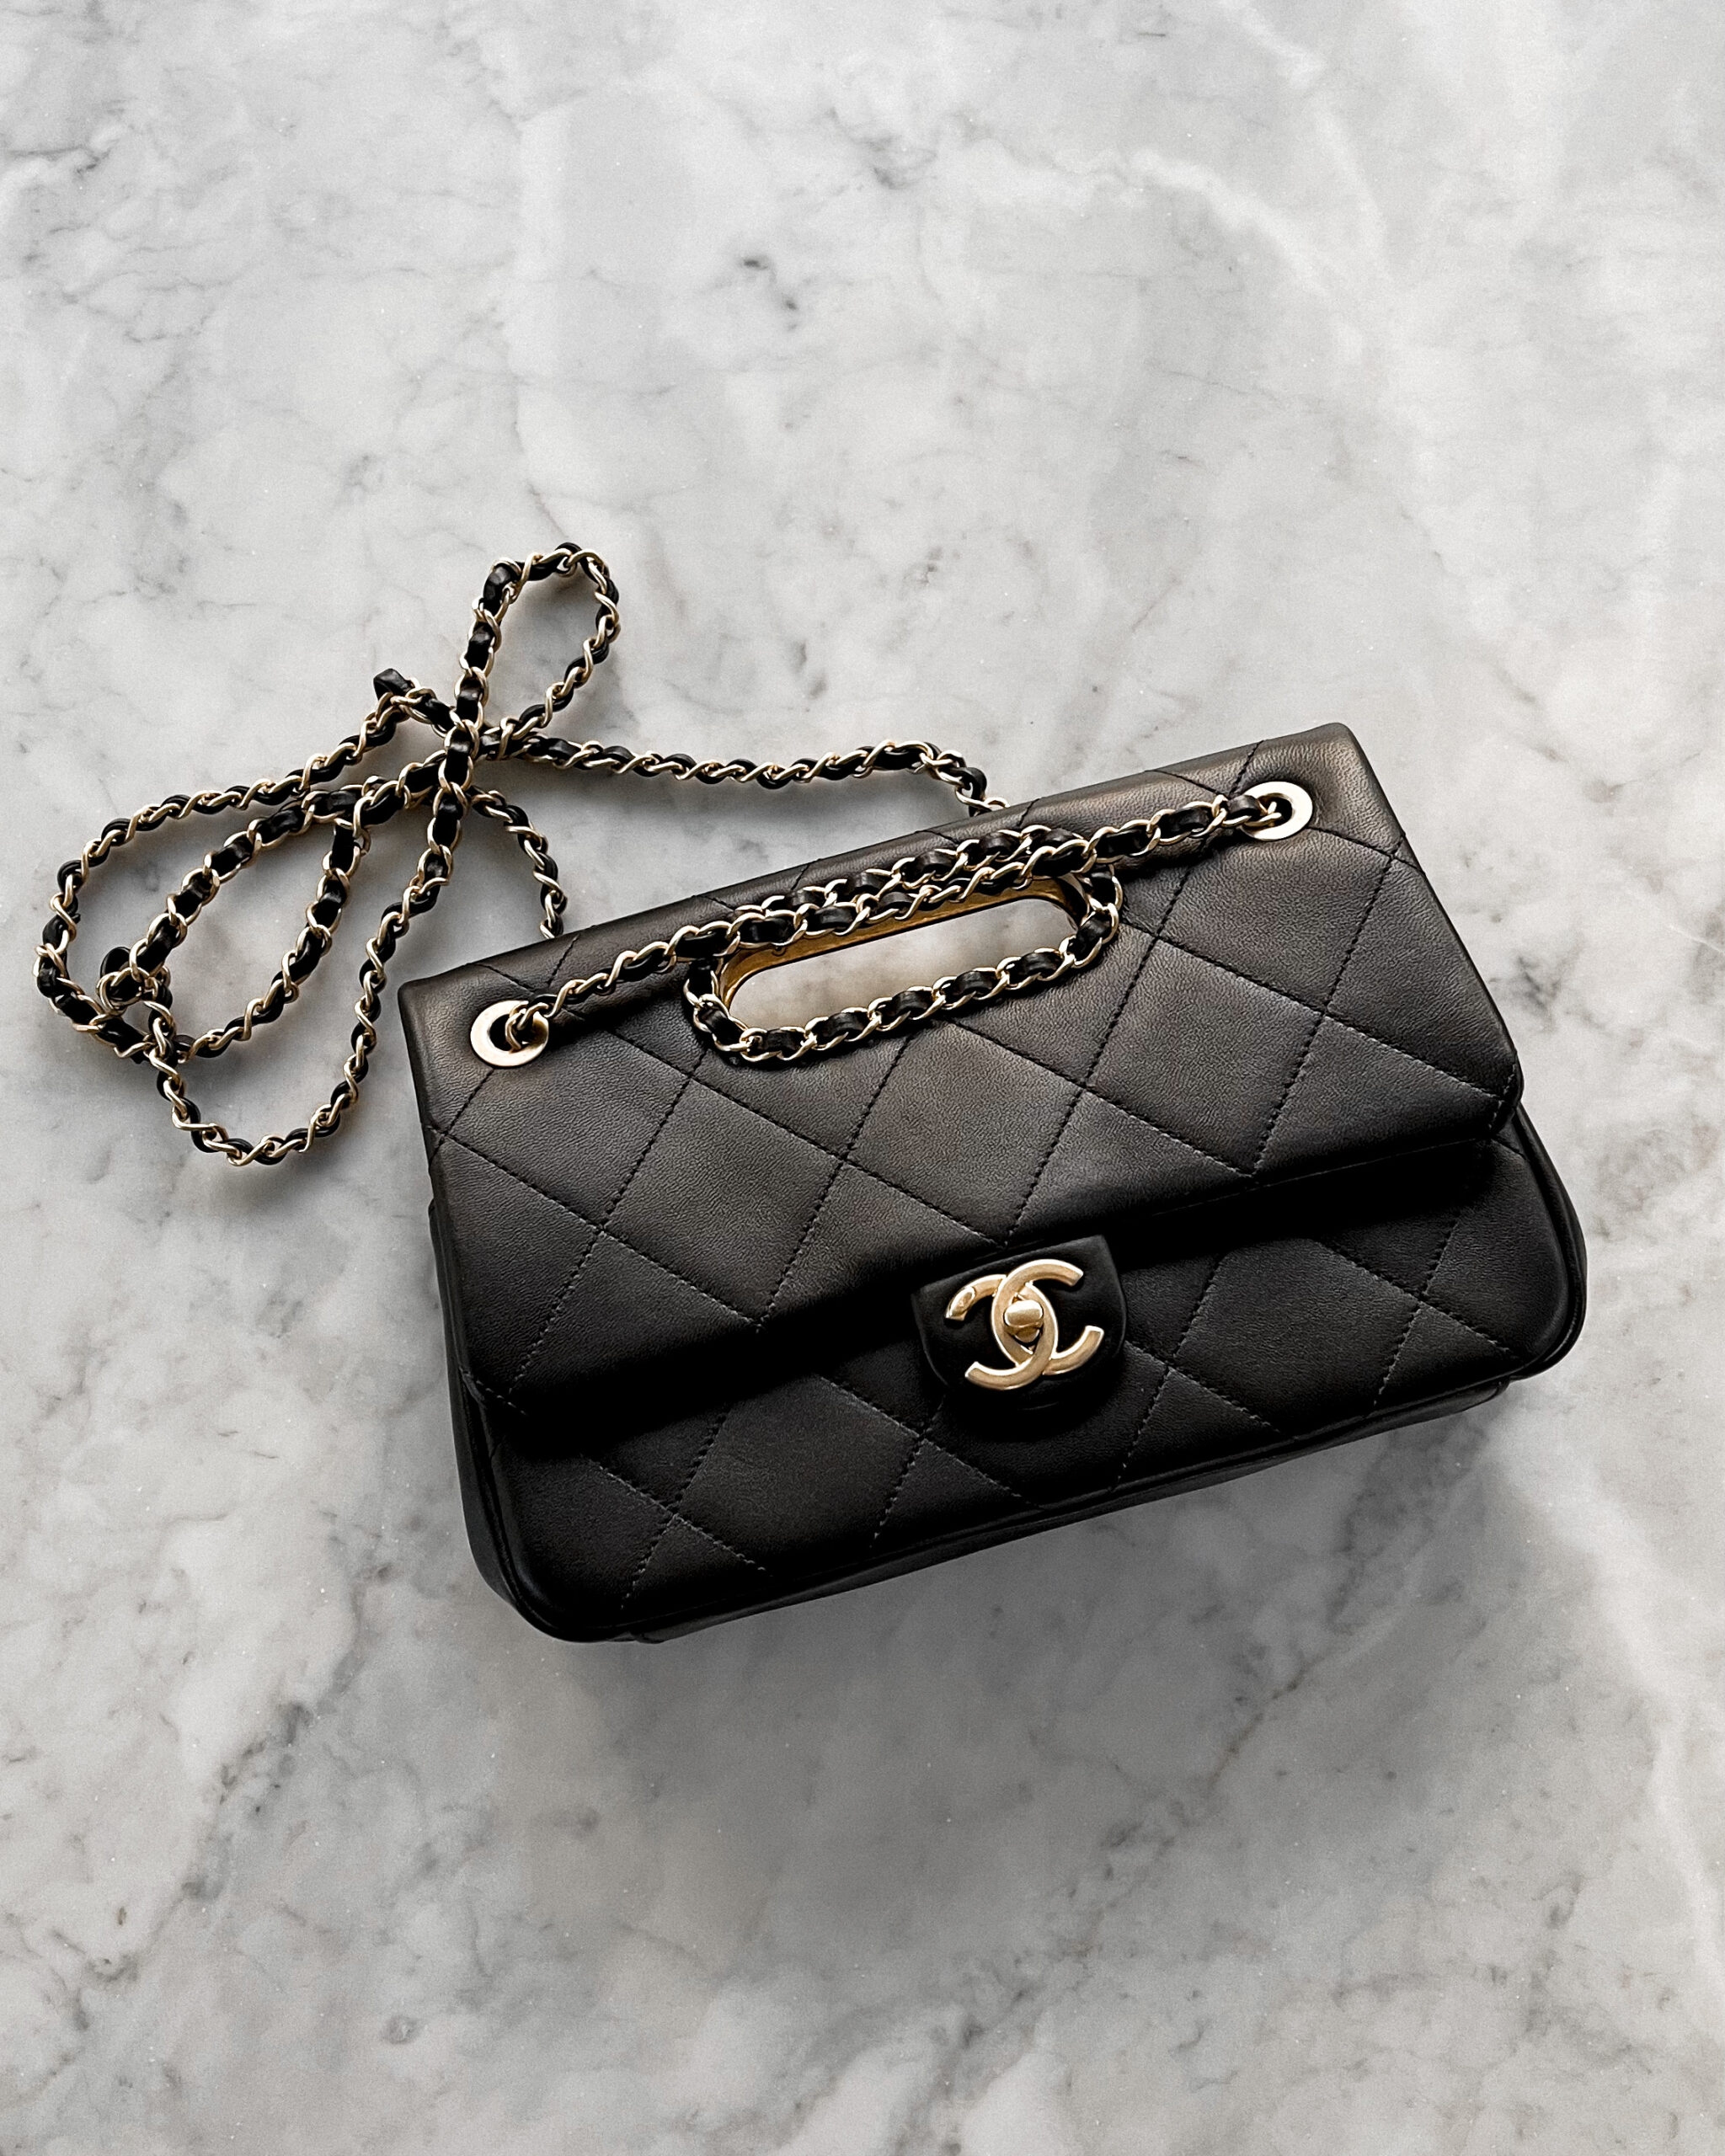 Fashion Jackson Black Chanel Handbag